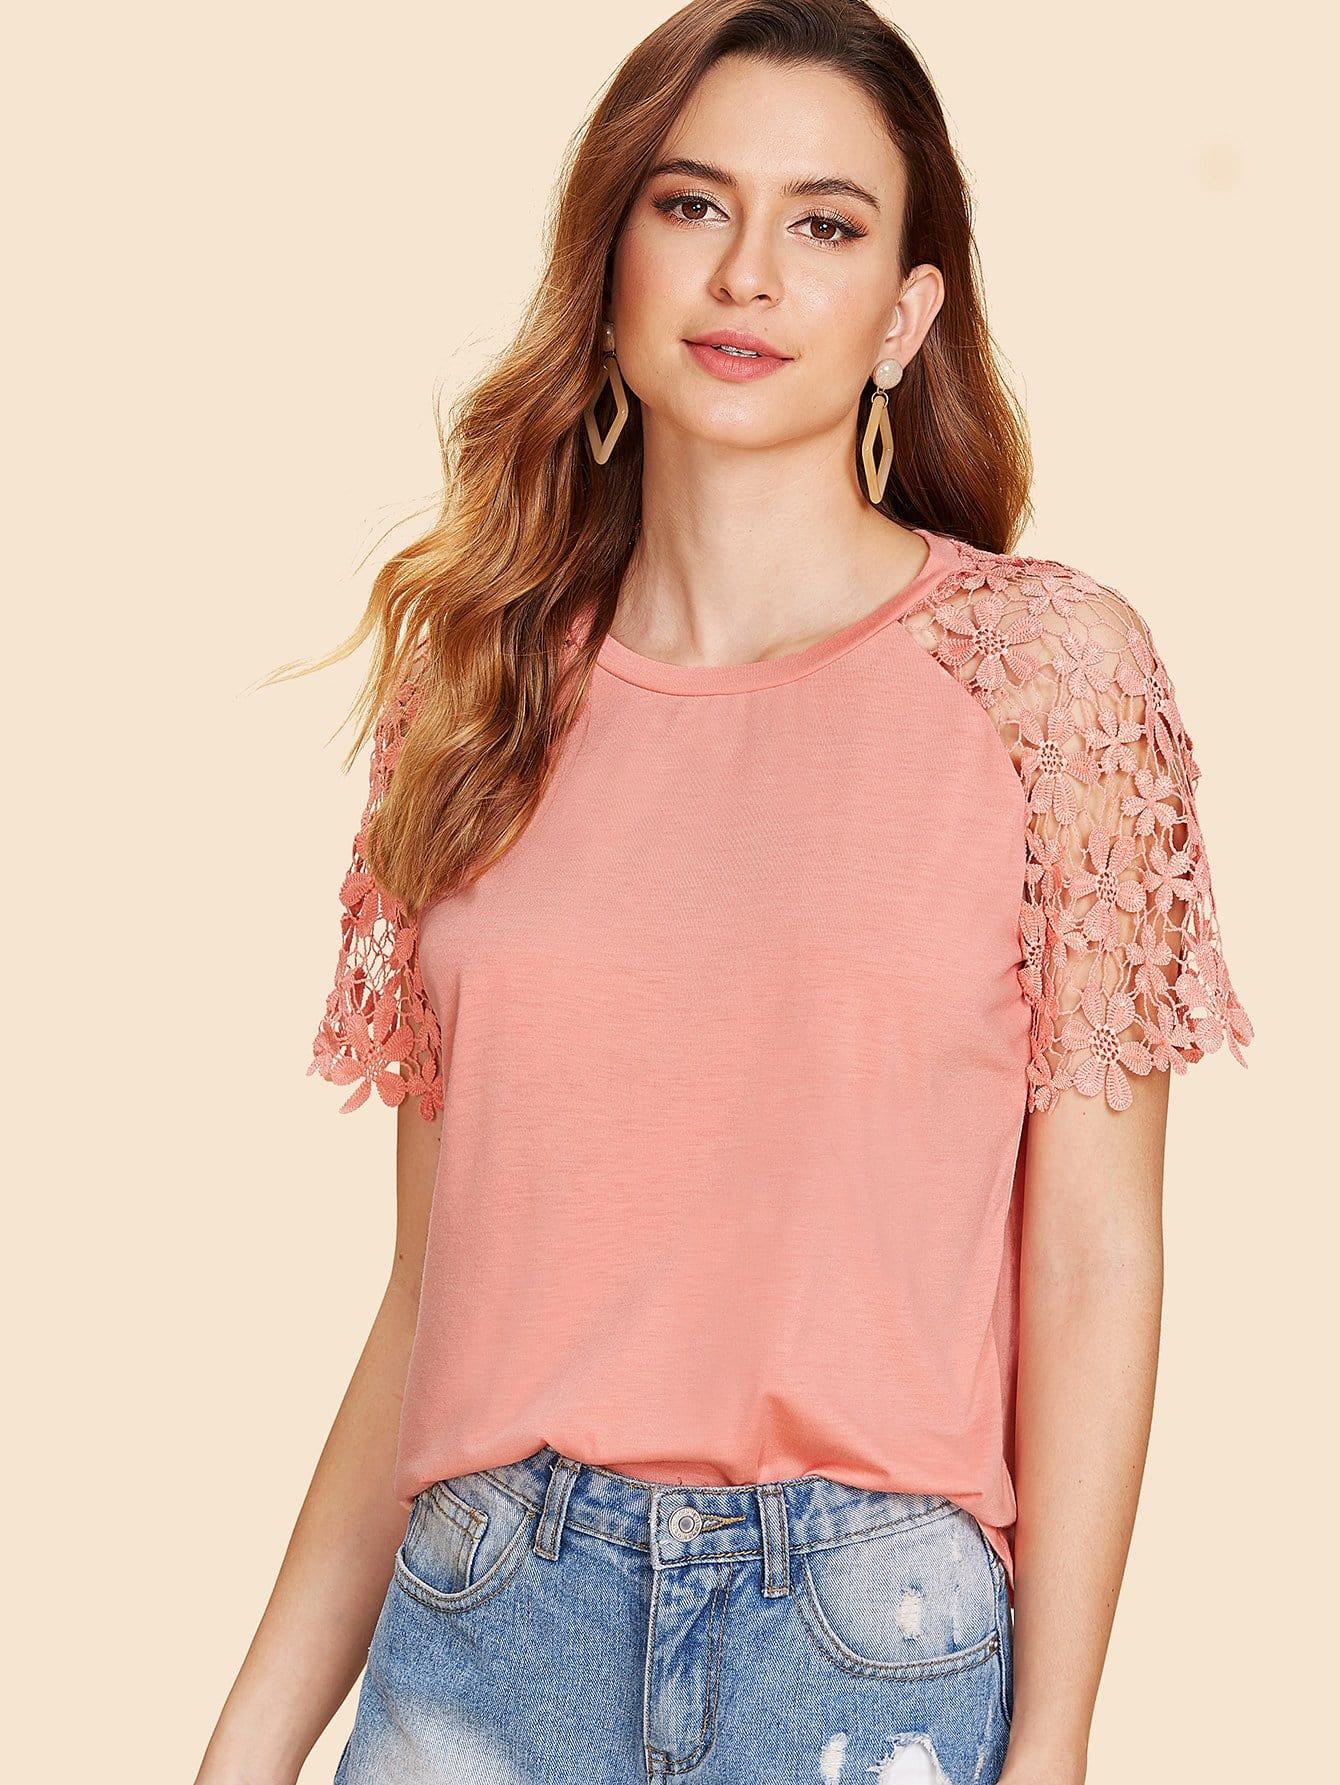 Floral Lace Raglan Sleeve T-shirt plus size floral raglan sleeve lace t shirt